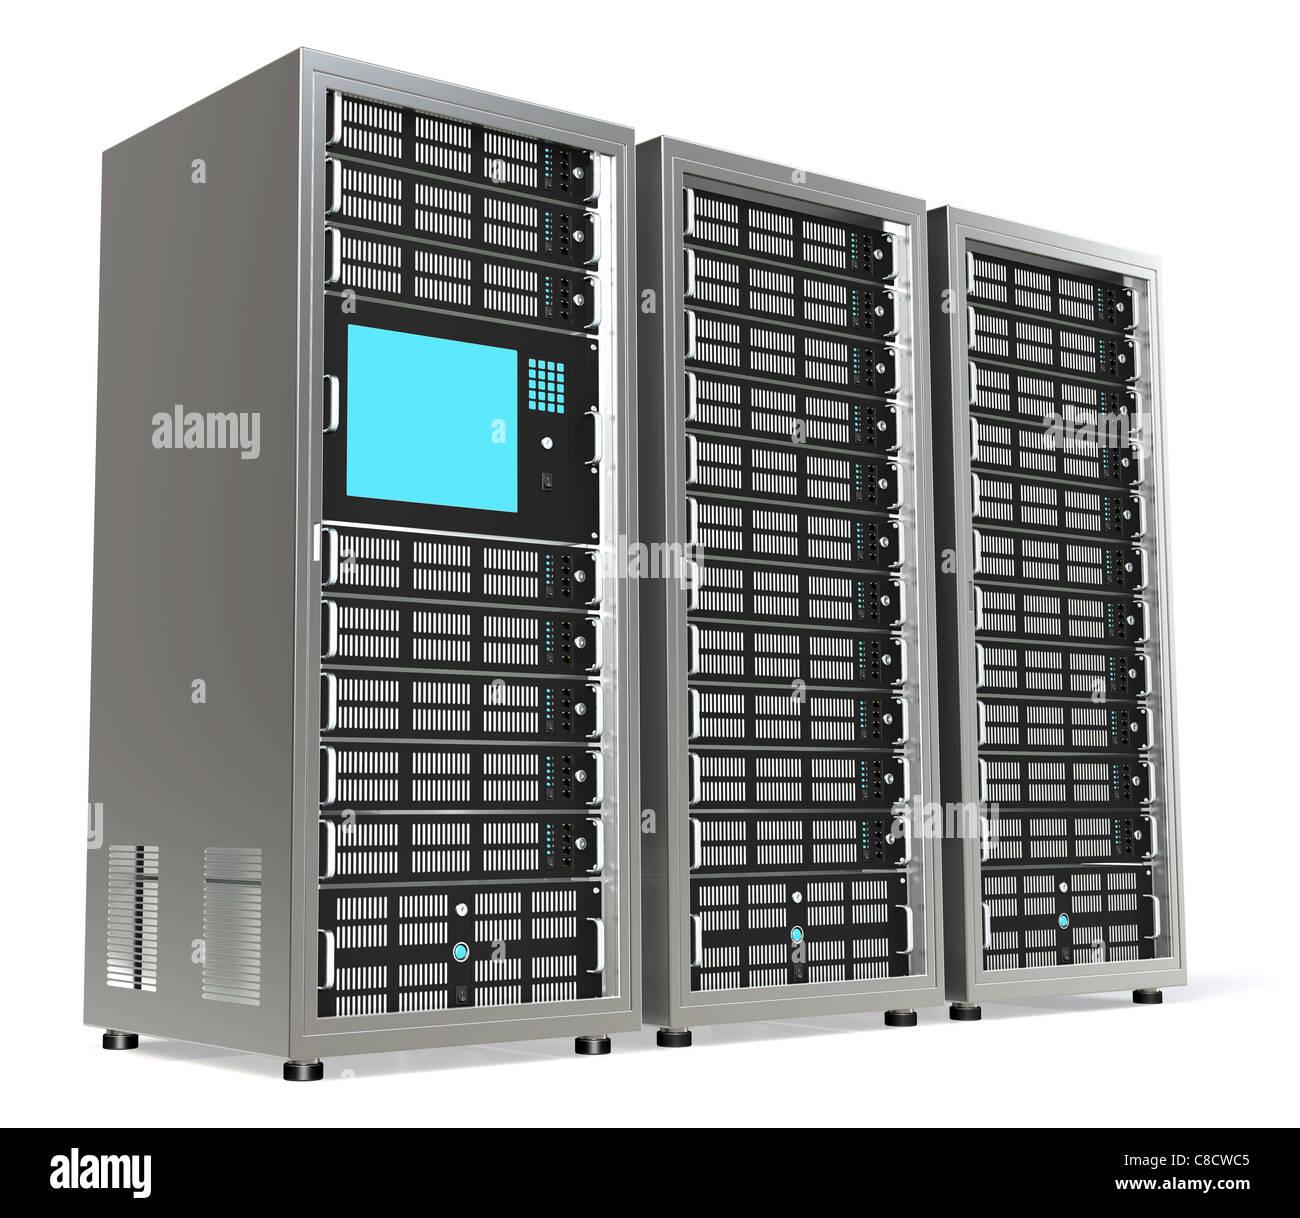 Rack Mounted Server Stock Photos & Rack Mounted Server Stock